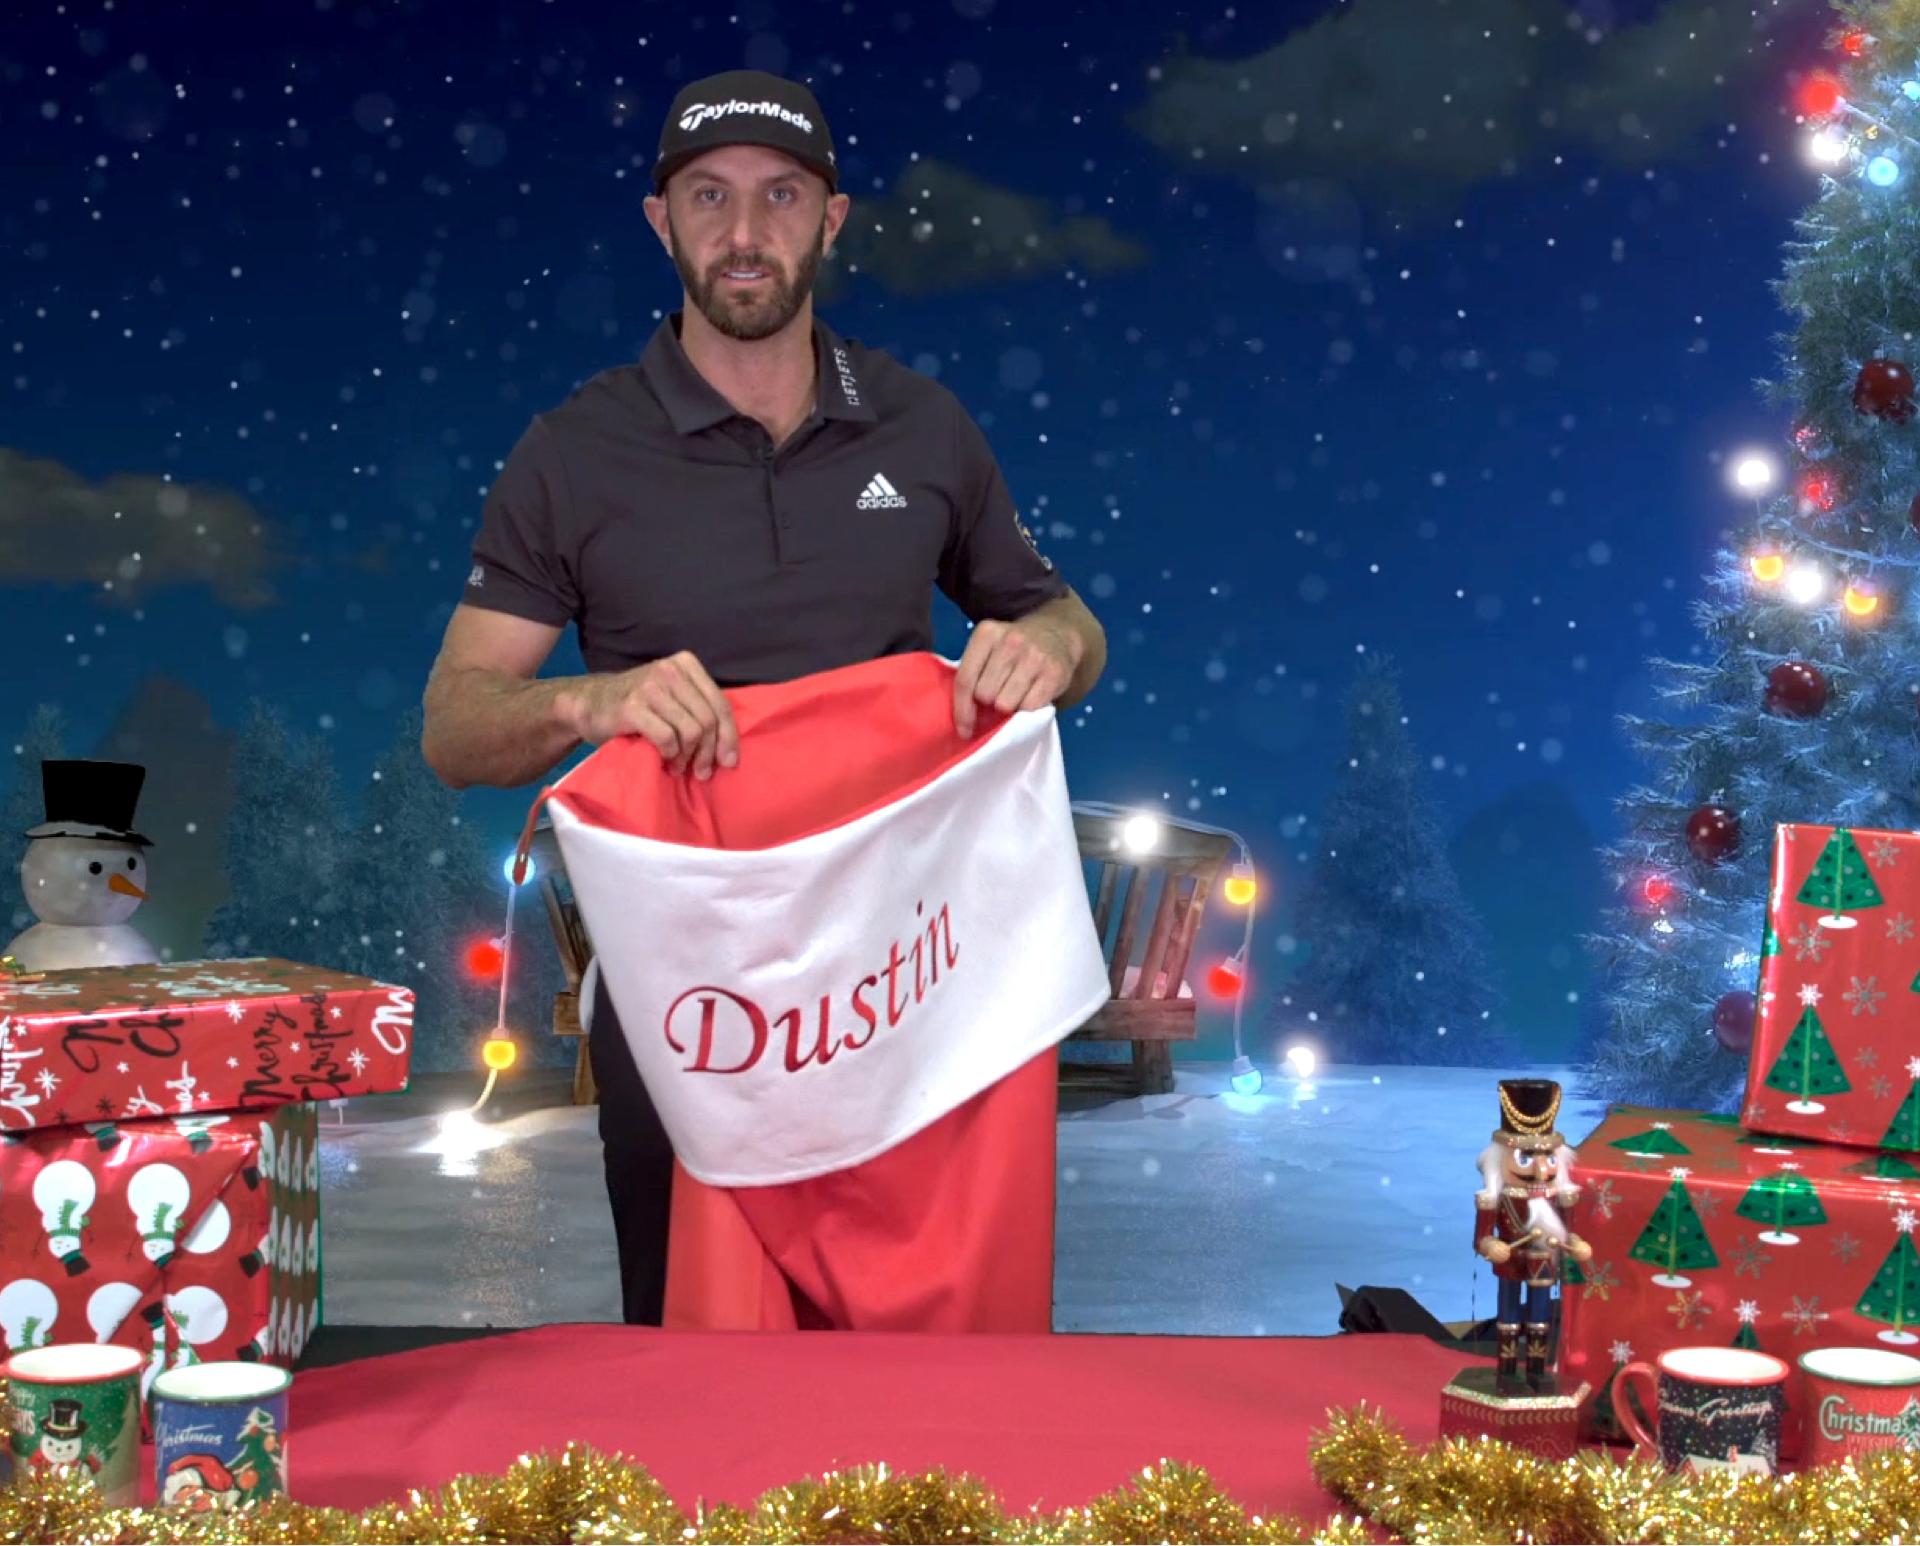 Dustin Johnson Stocking